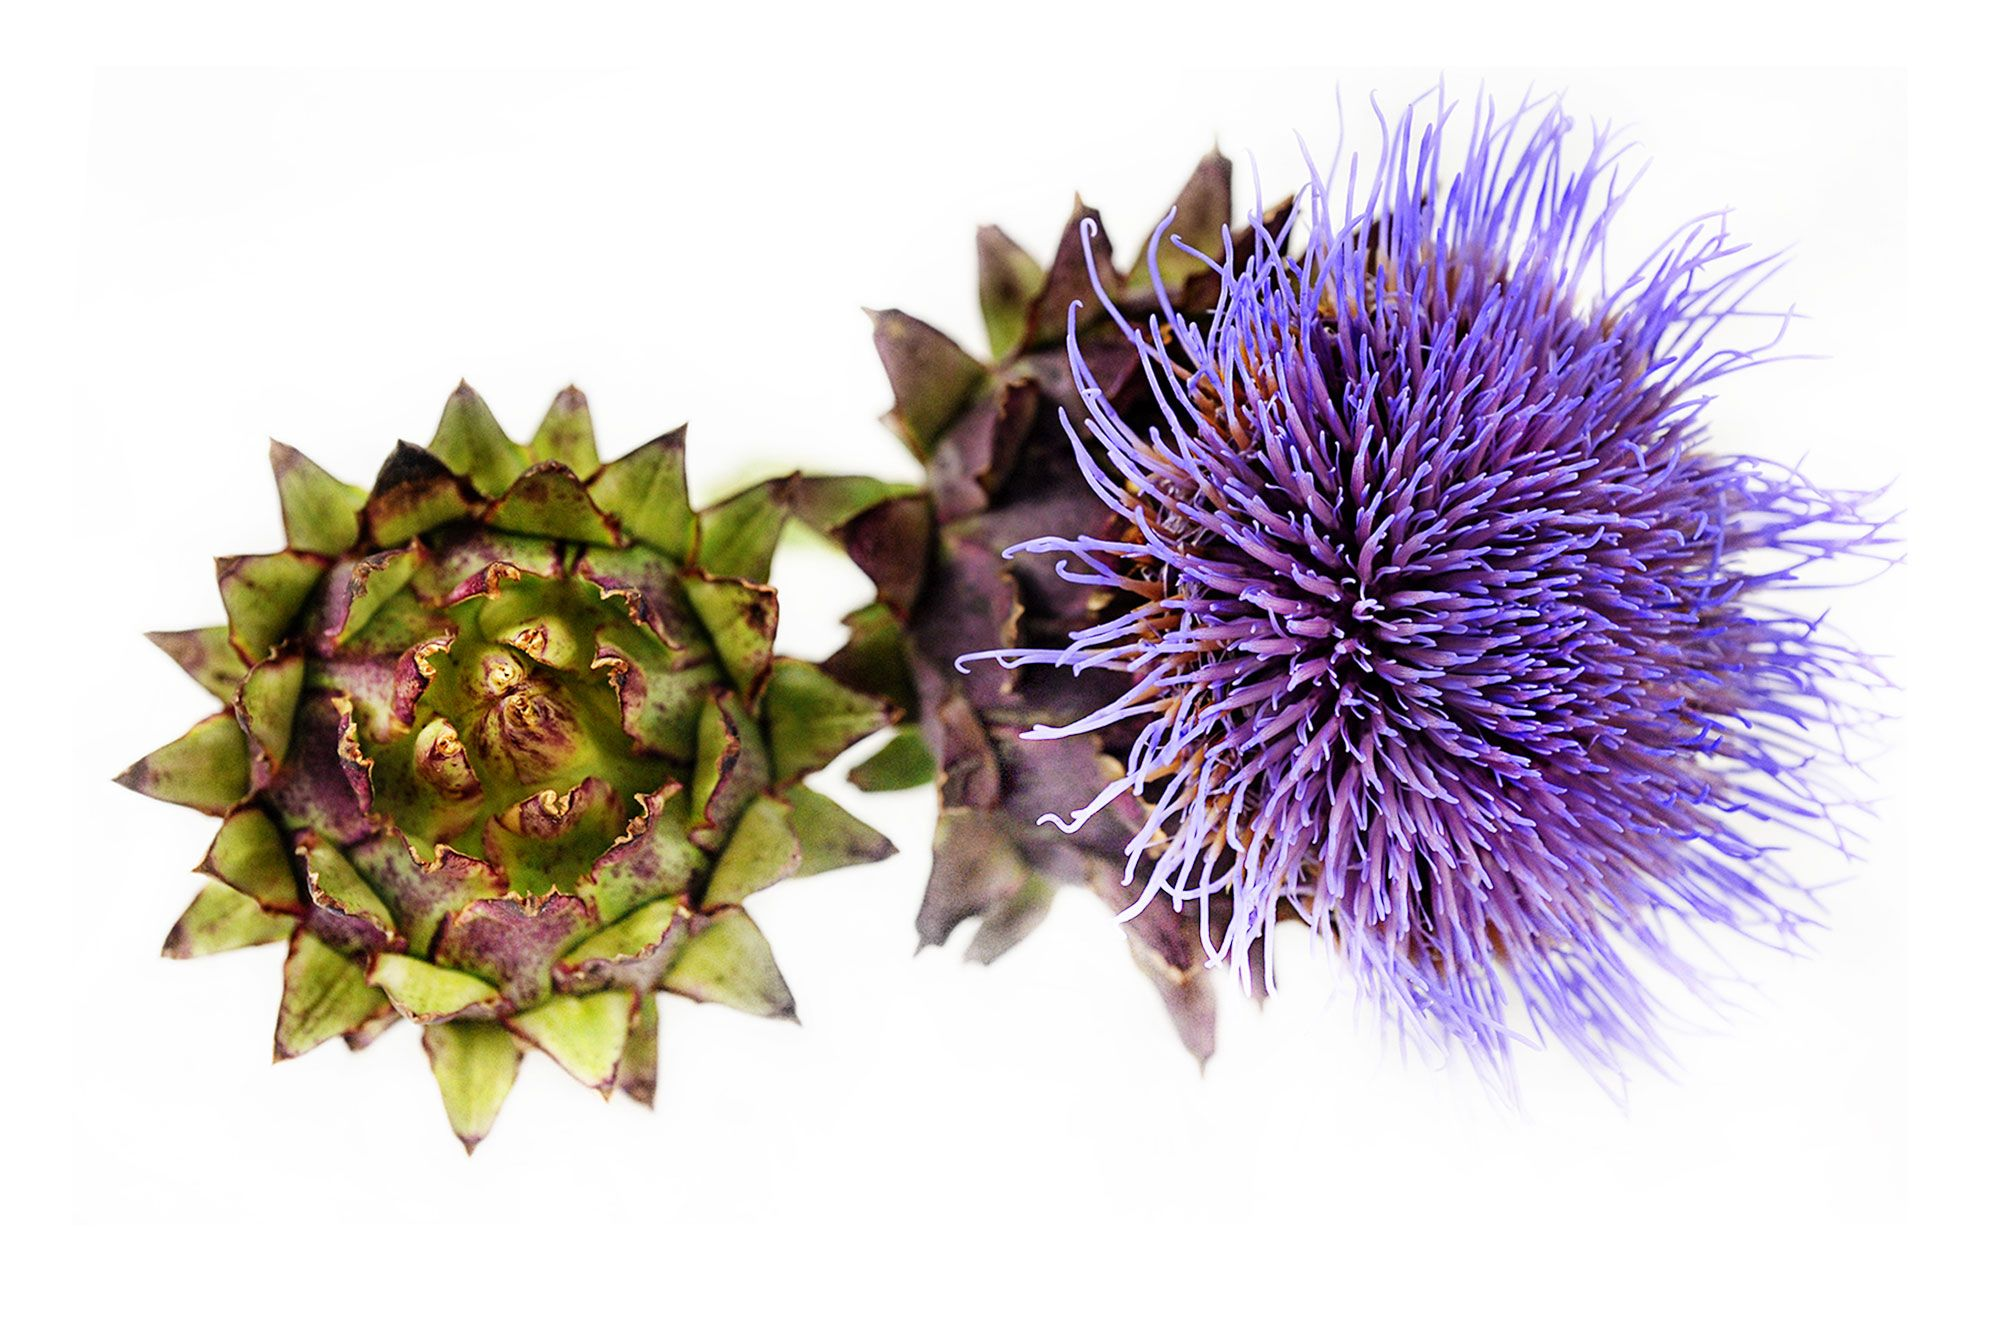 Buy herbs online - Buy Heirloom Garden Seeds Vegetables Rare Flowers And Herbs Online Over 1800 Varieties